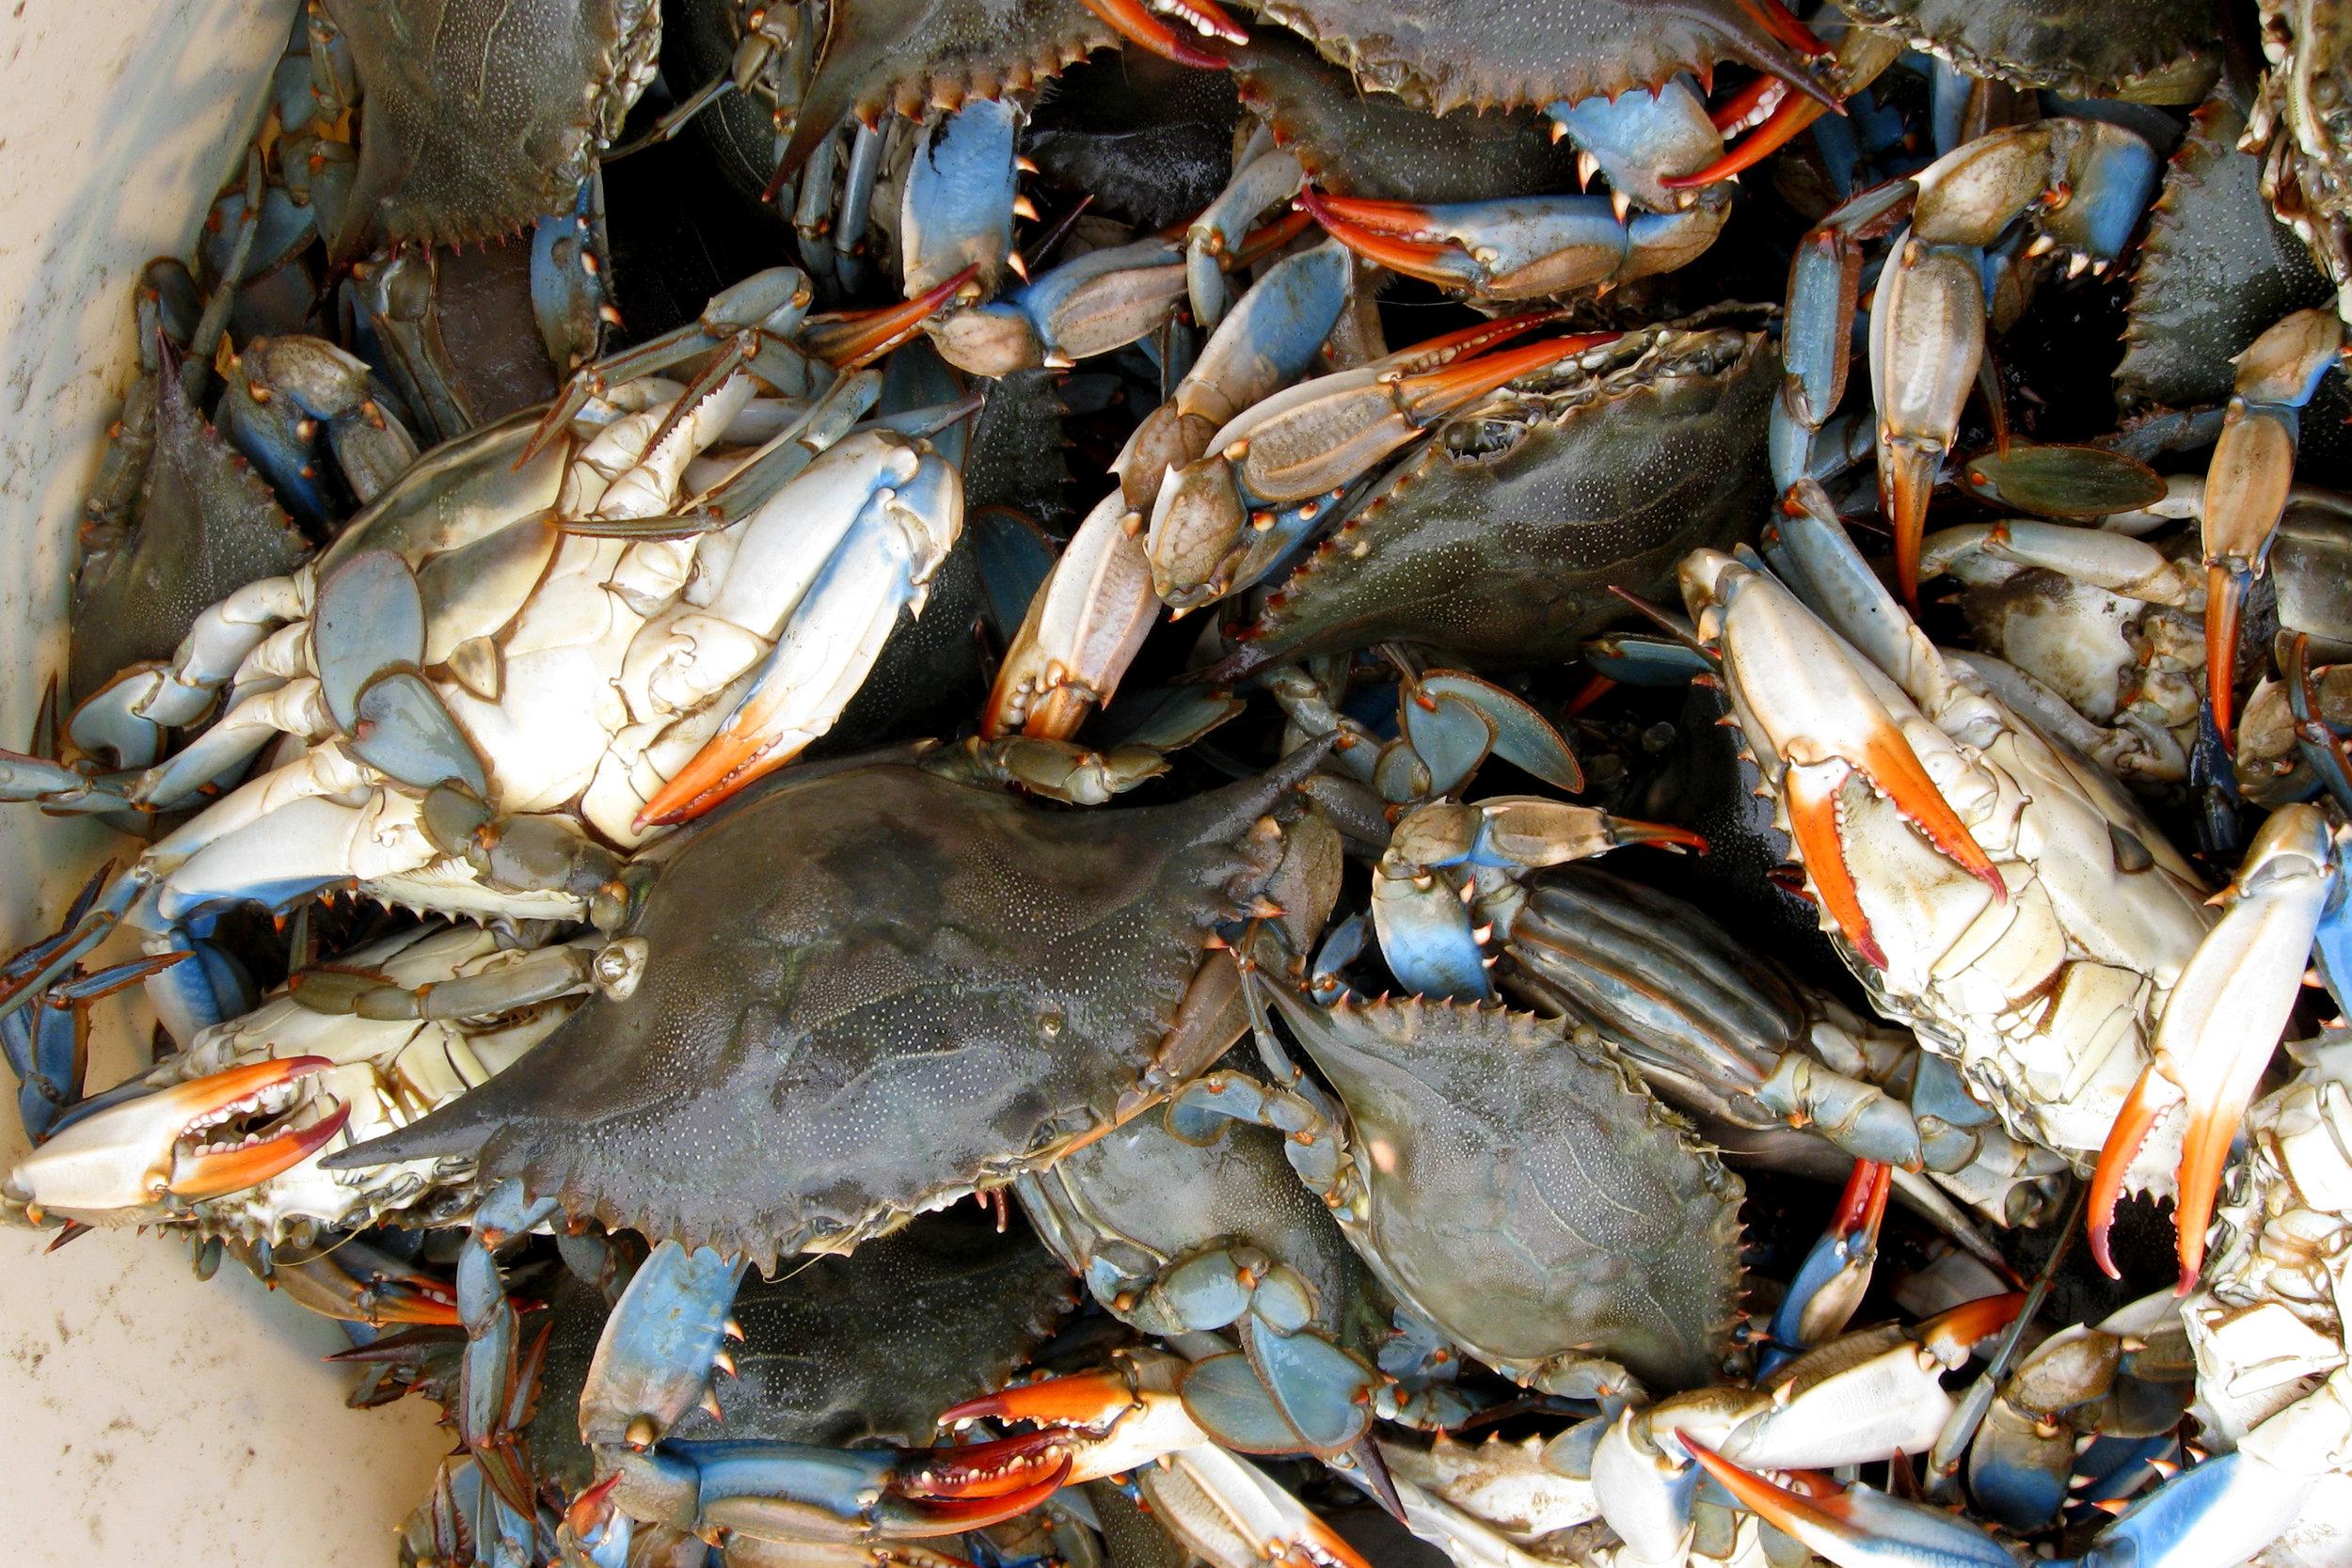 SquarespaceImage19-marinefisheries-crabbucket.jpg